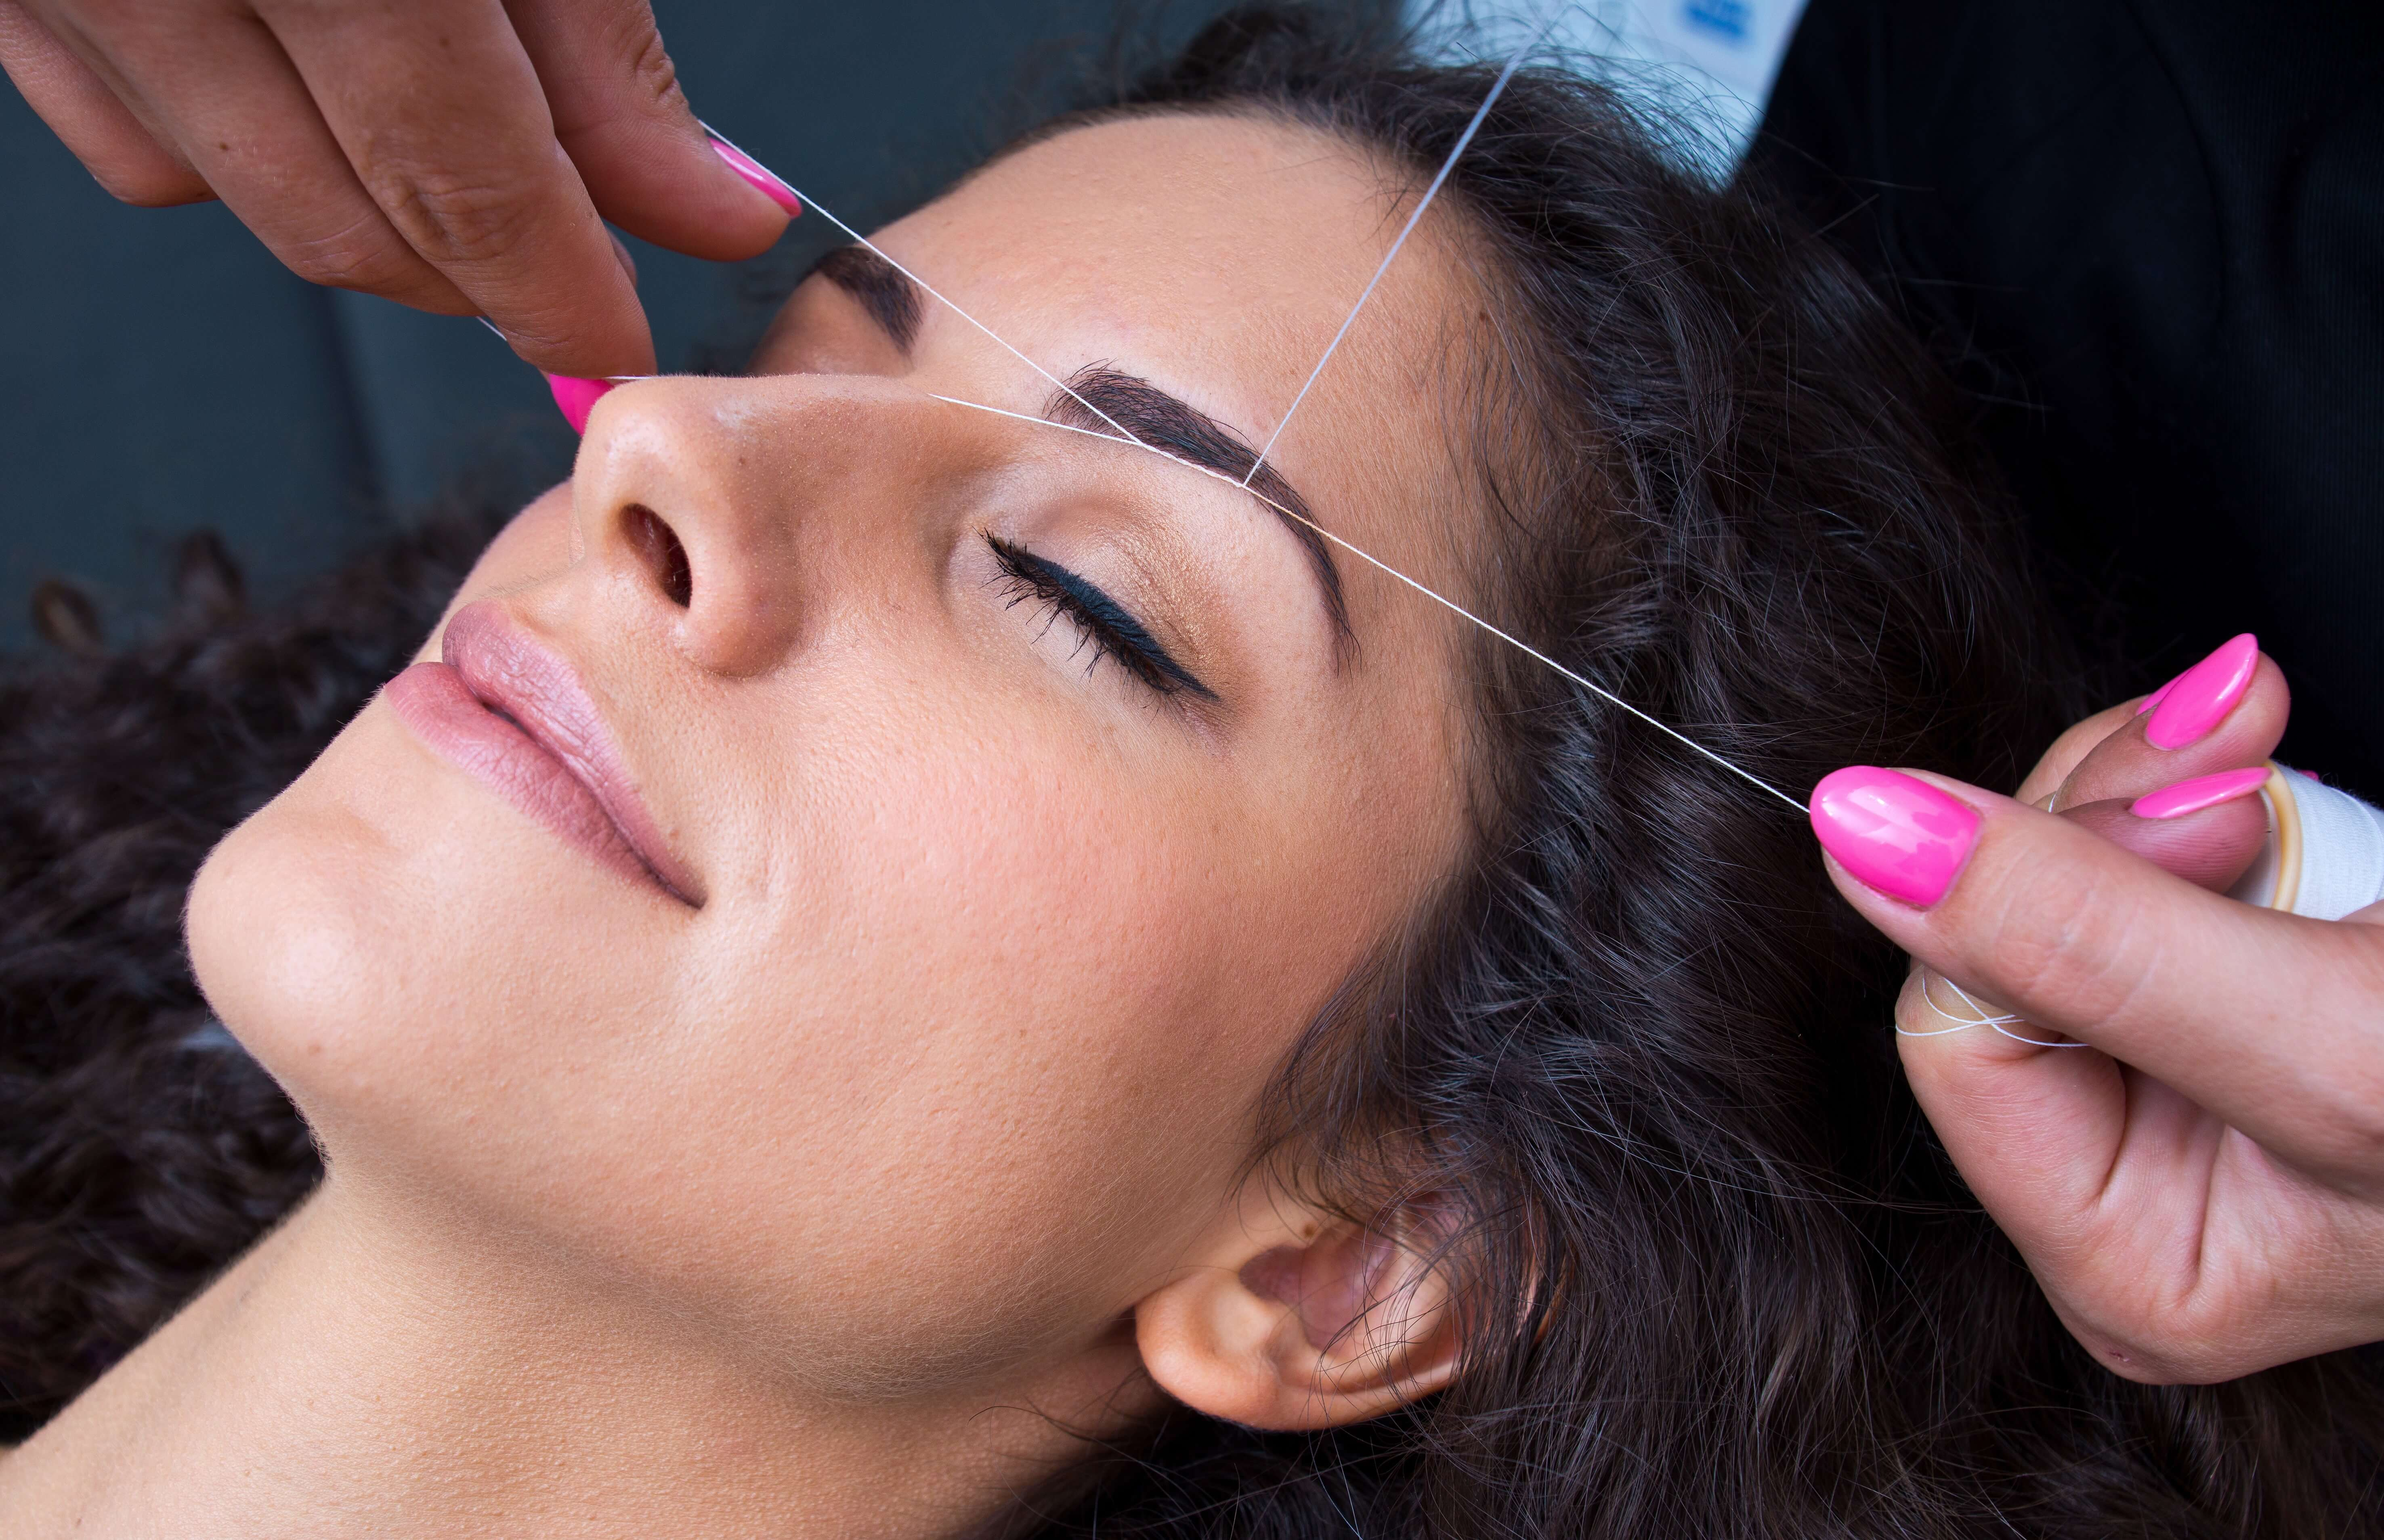 eyebrow threading procedure up close